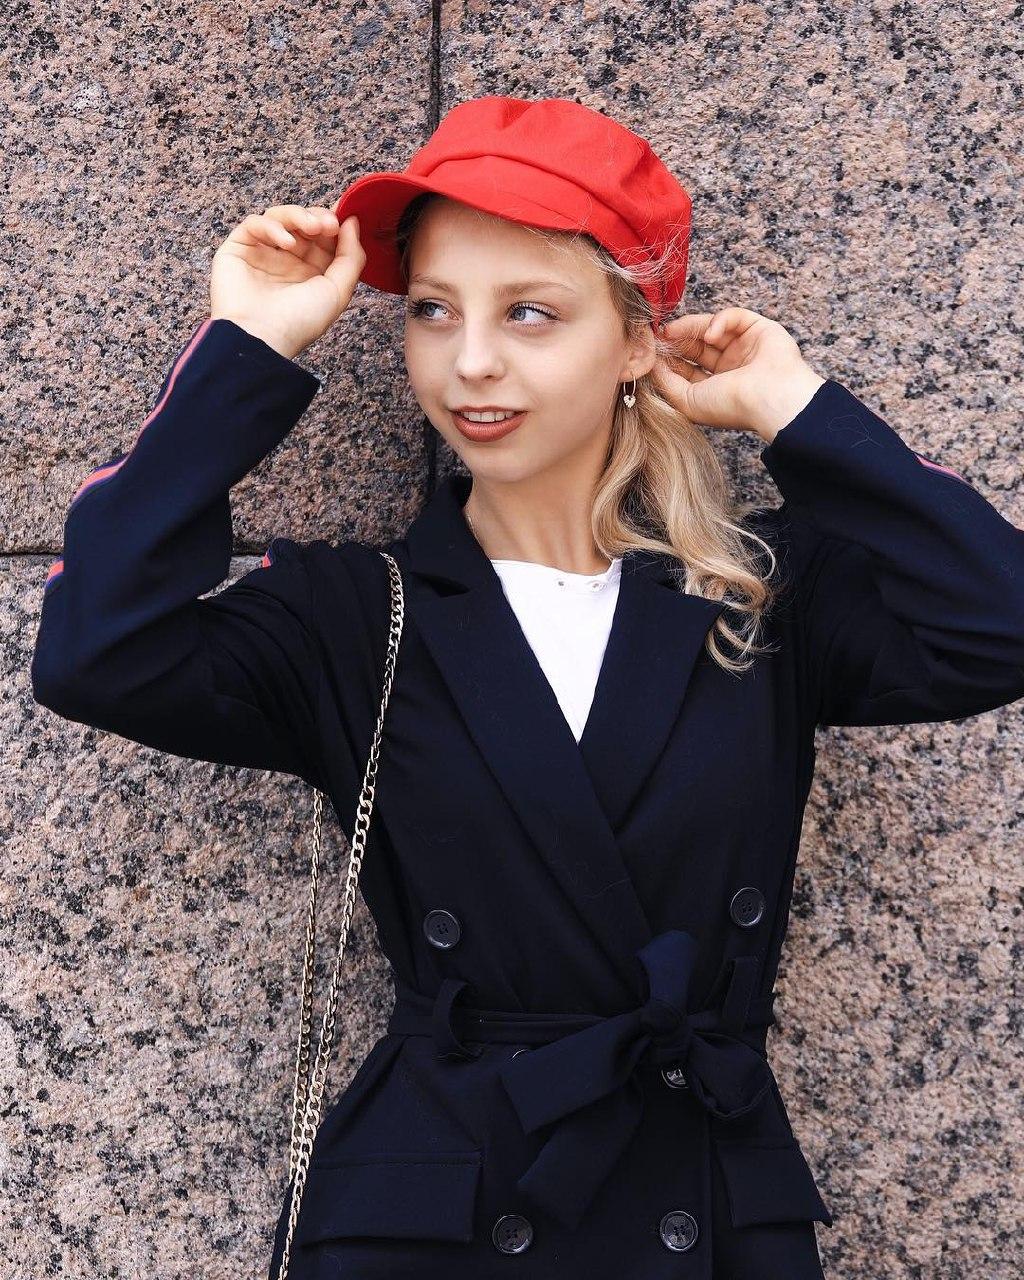 Александра Бойкова-Дмитрий Козловский - Страница 12 QmcTS